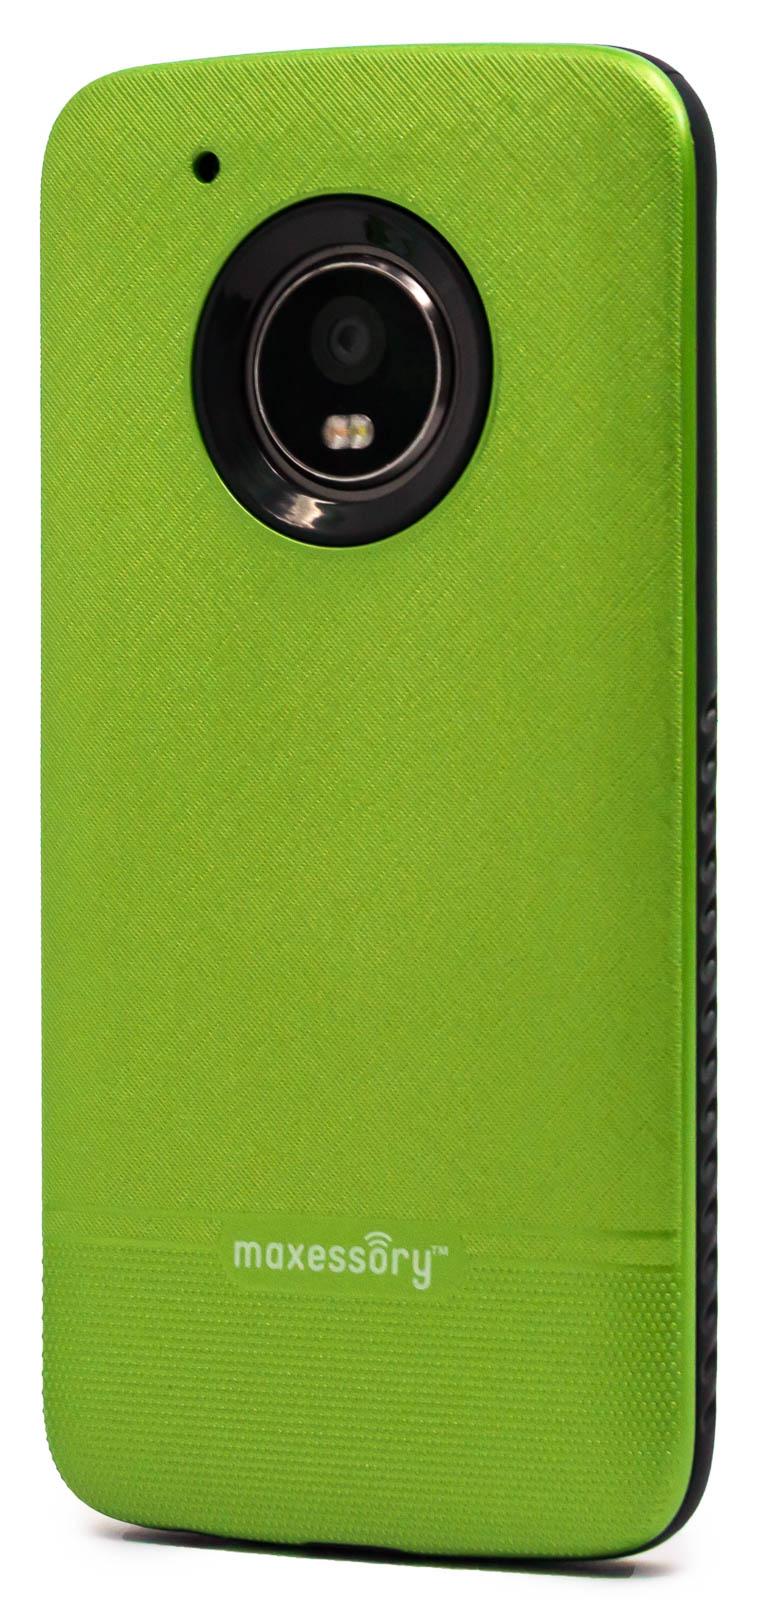 Moto-G5-Plus-Case-Moto-X-17-Case-Ultra-Thin-Hard-Body-Tactile-Shell-Cover thumbnail 19